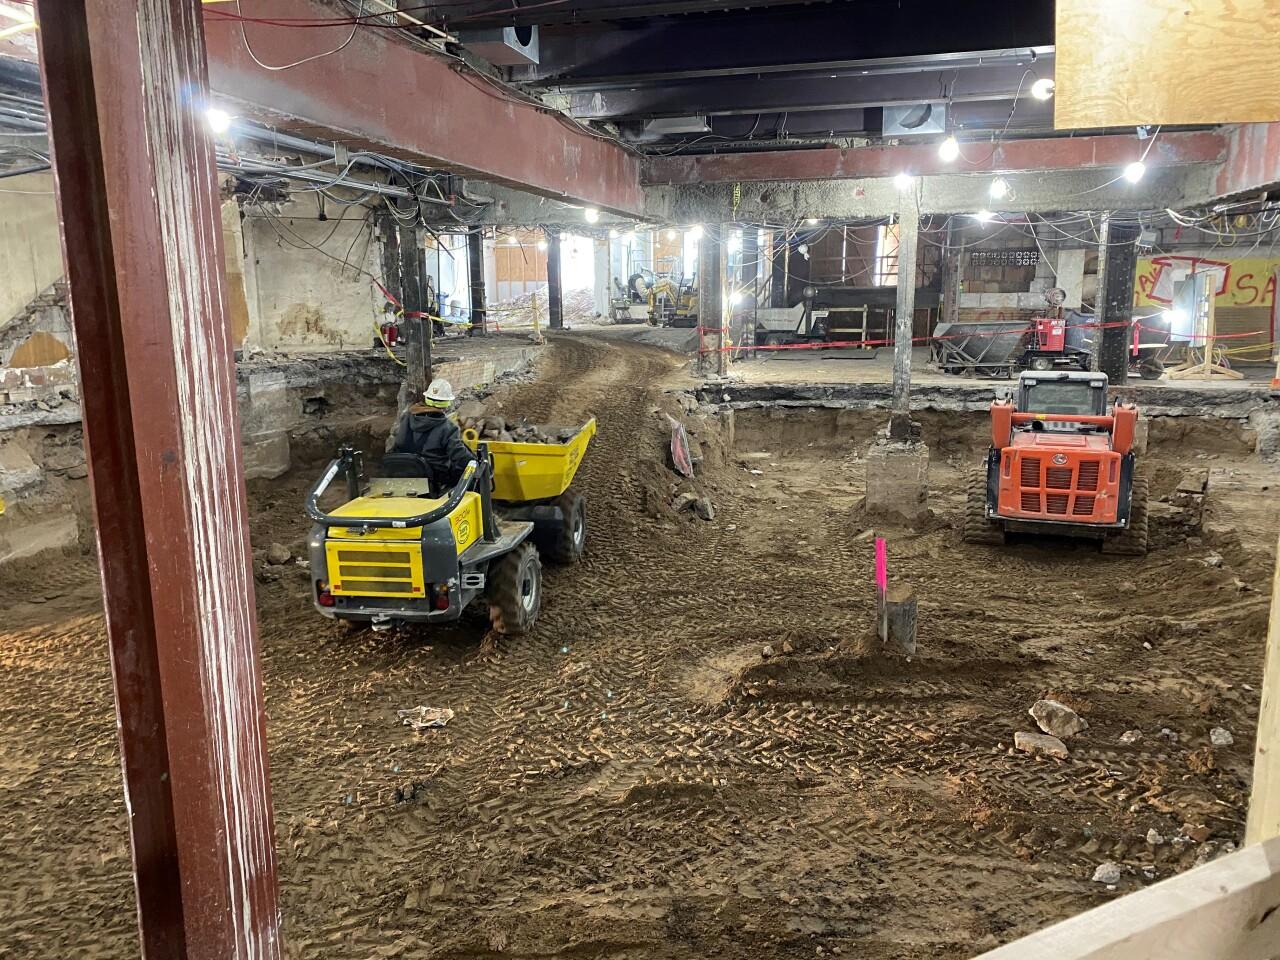 Statler basement construction 1